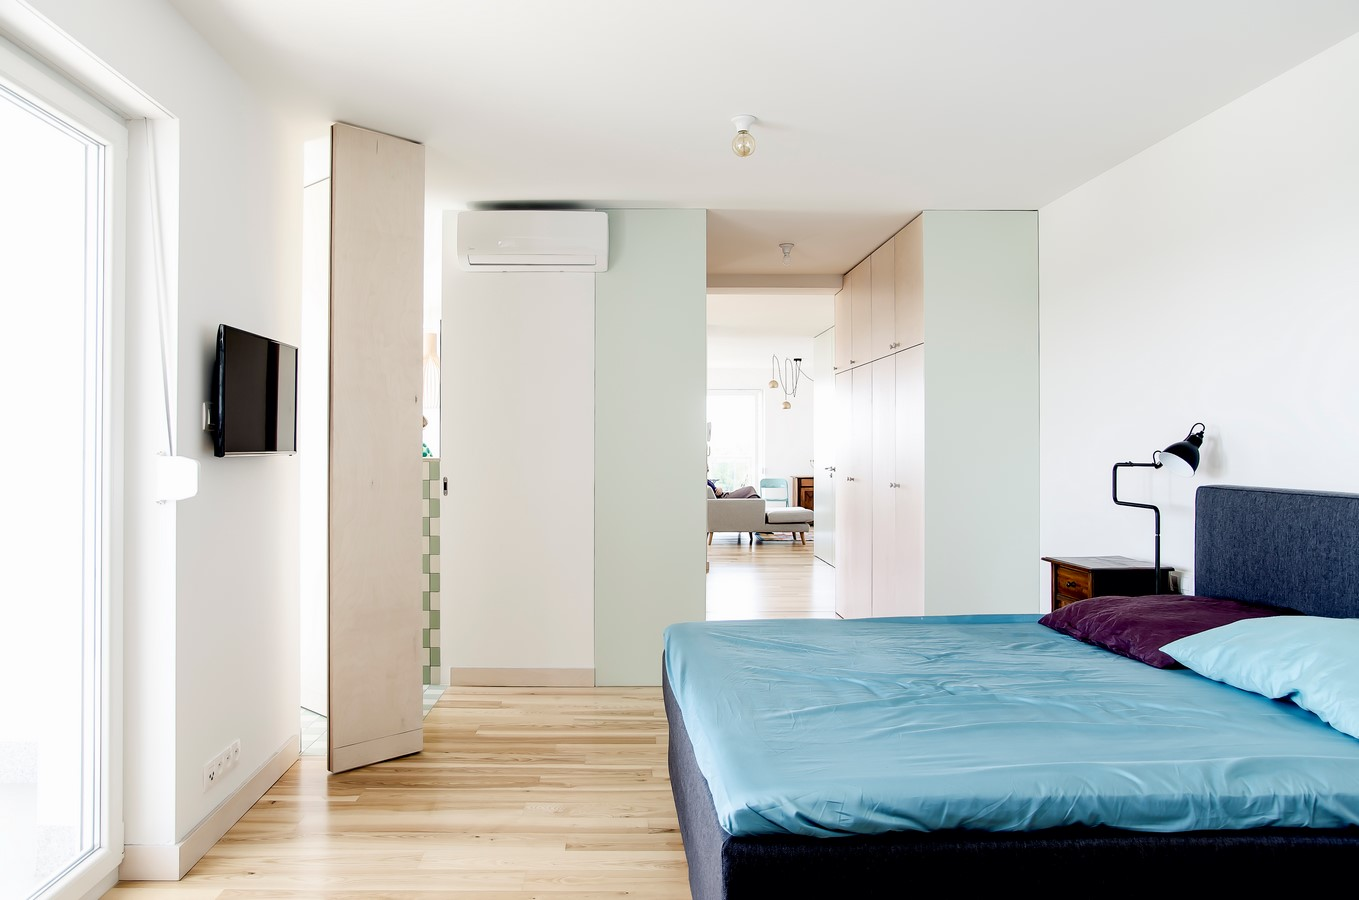 Apartment with a view by Atelier Starzak Strebicki - Sheet3